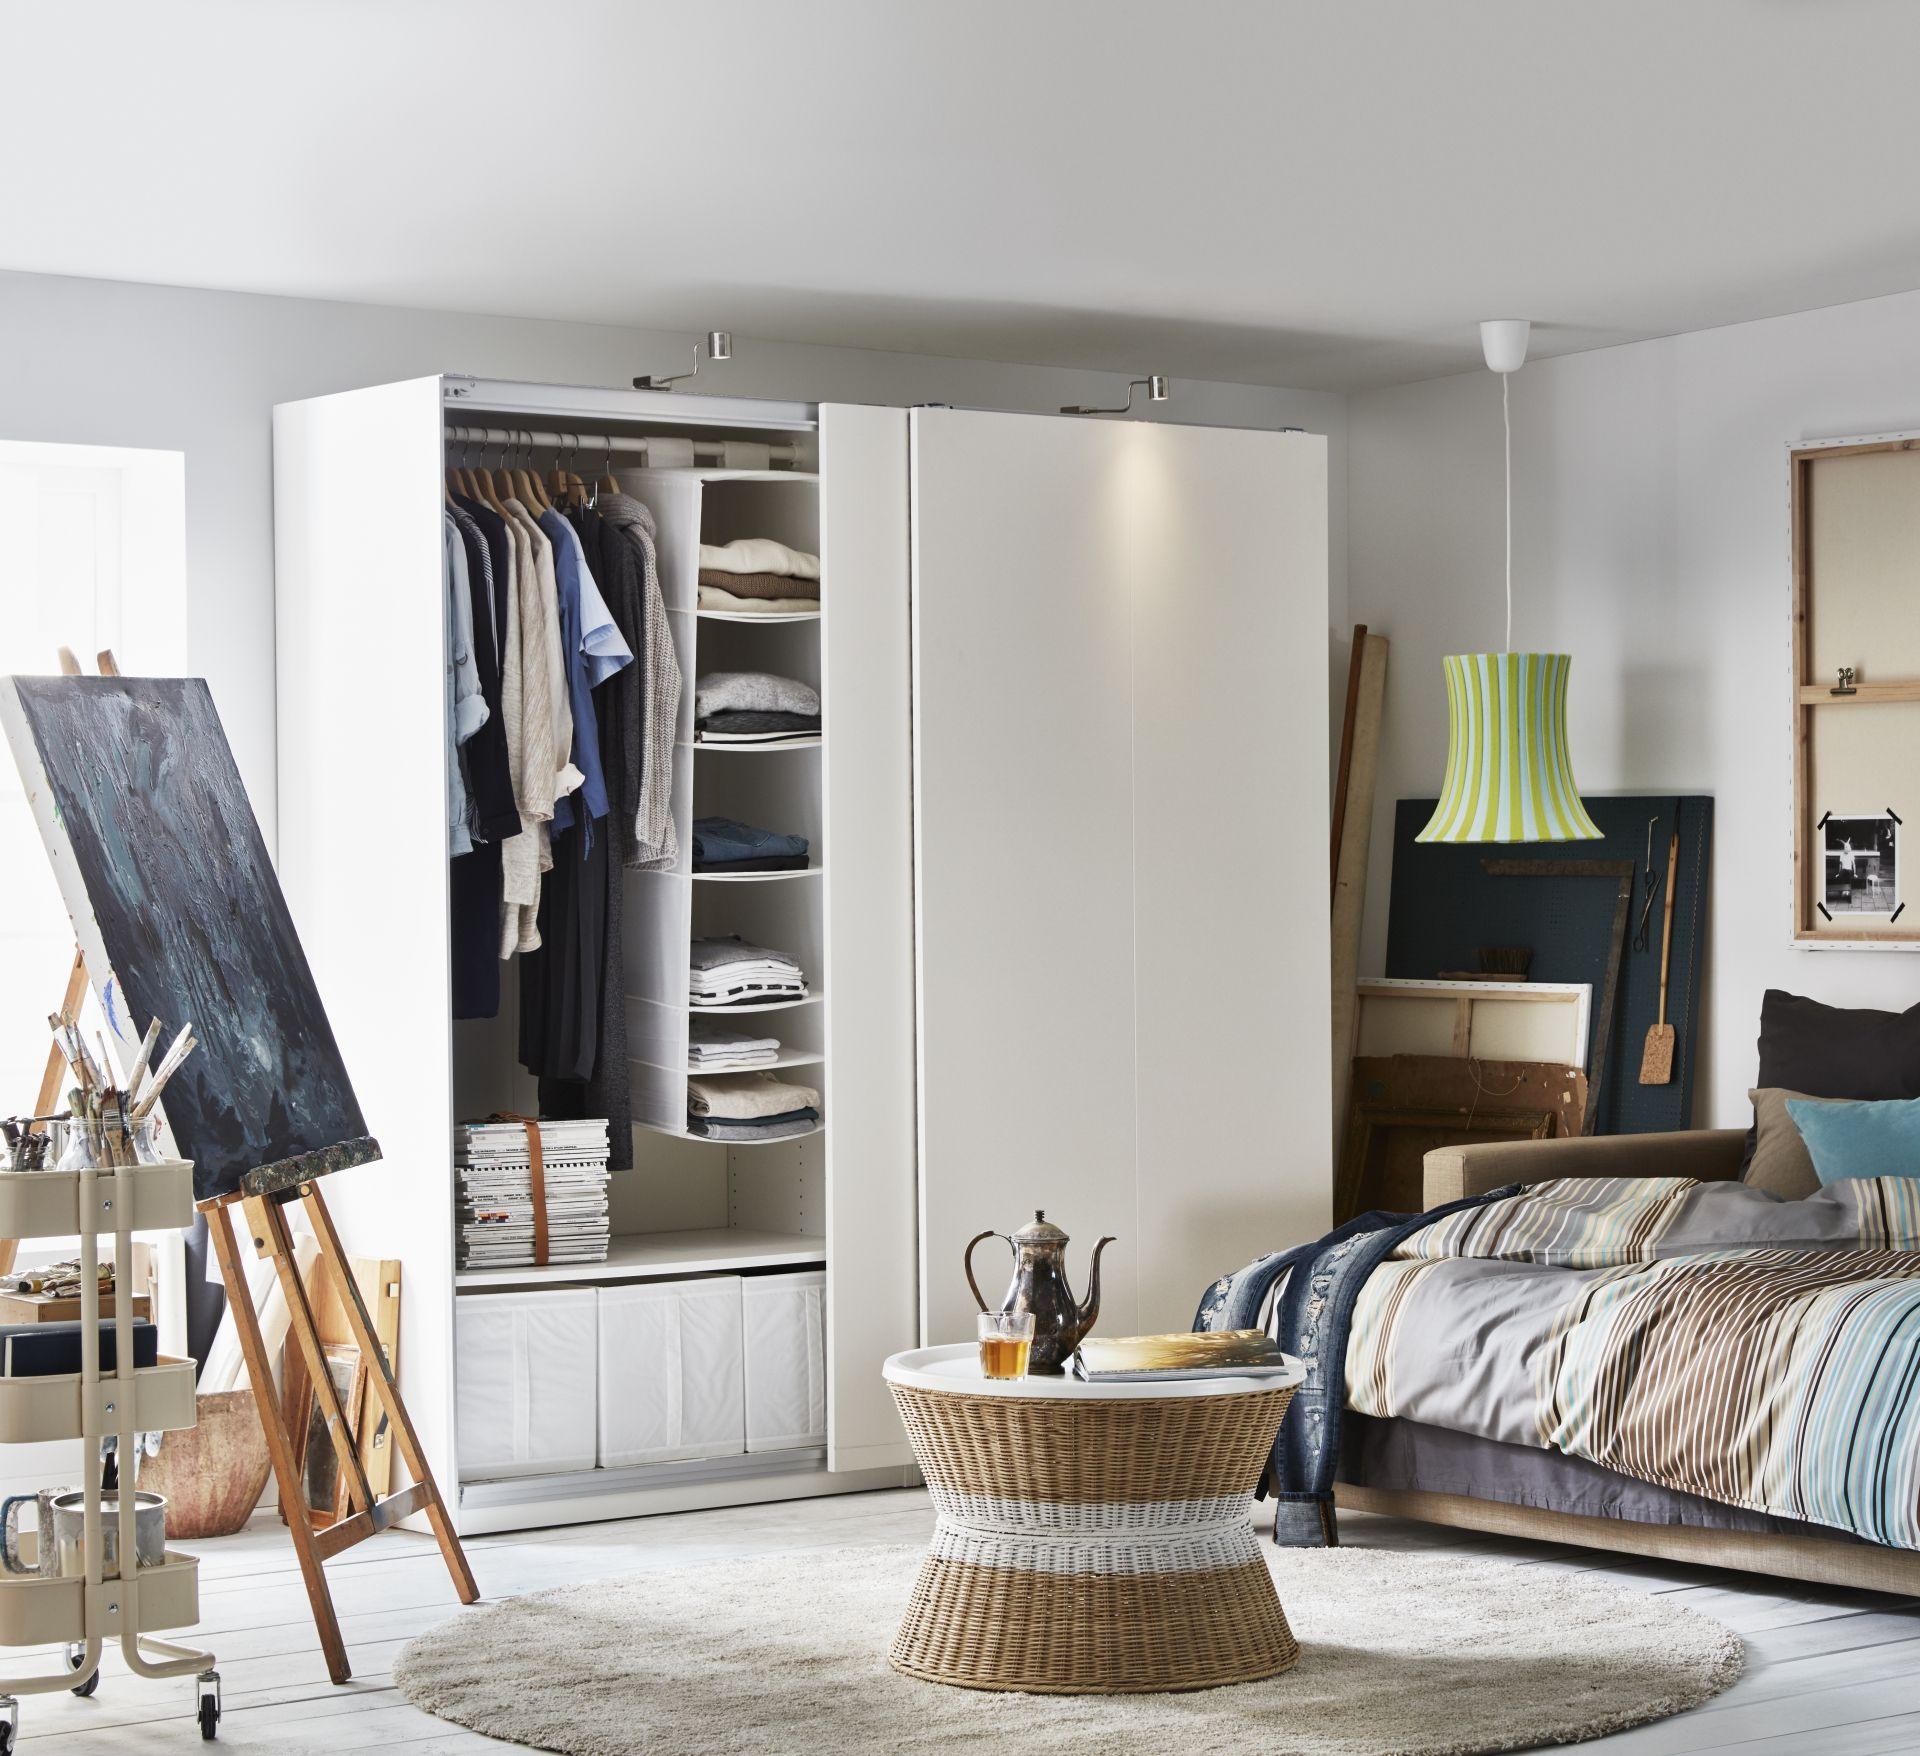 PAX garderobekast | IKEA IKEAnederland IKEAnl wooninspiratie ...